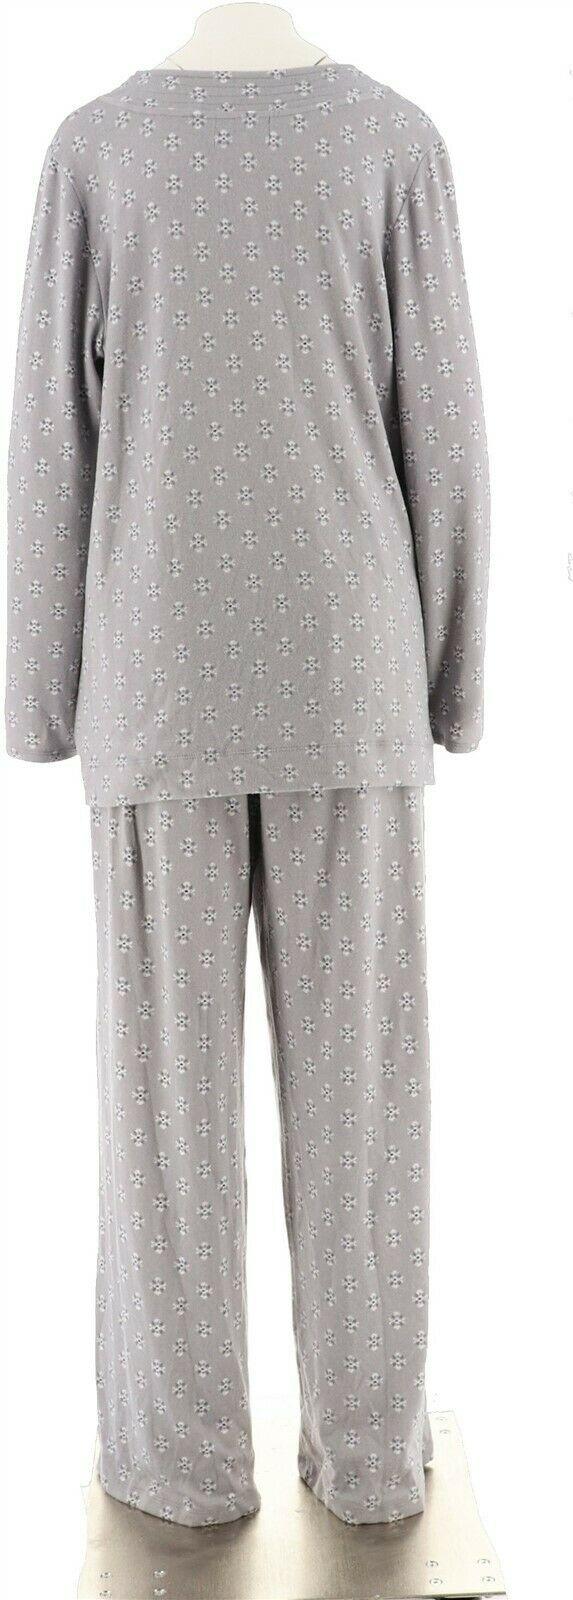 Carole Hochman Printed Hacci Lounge Pajama Set Mauve XL NEW A297471